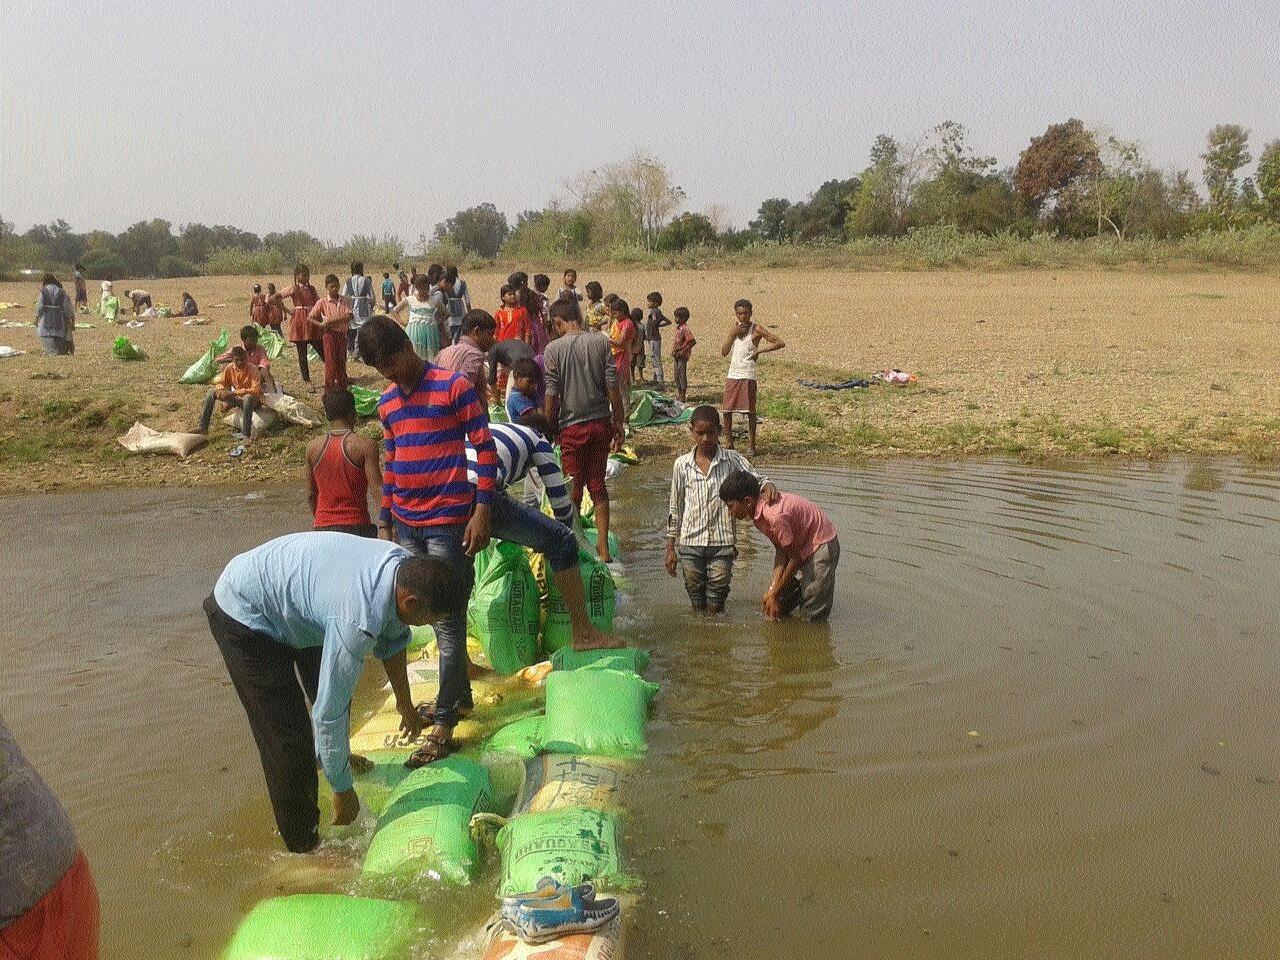 Students build temporary bridge over Half river